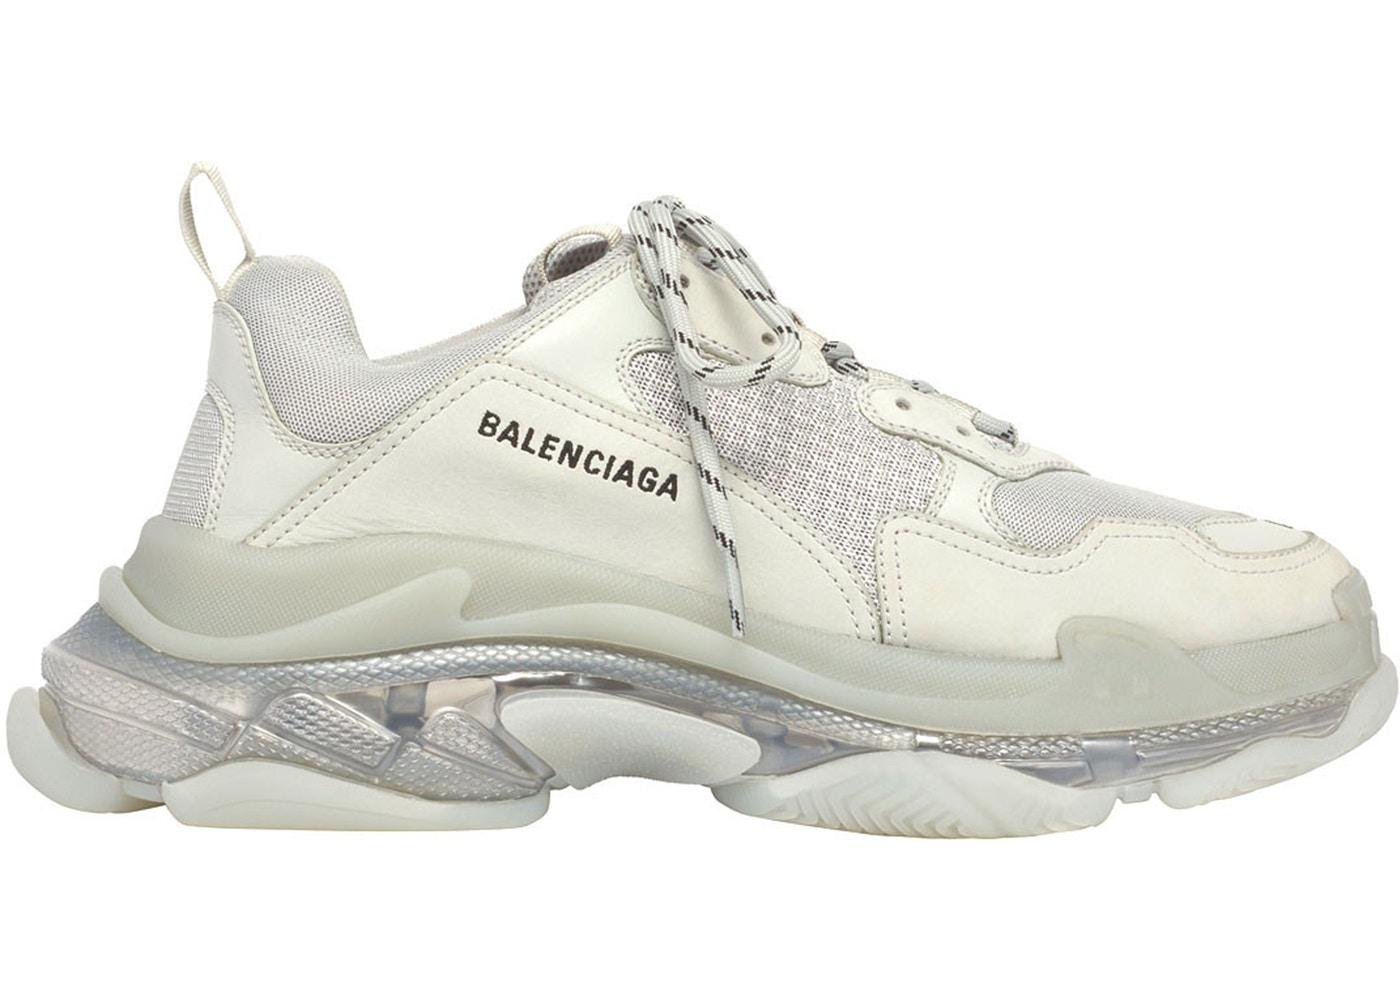 Balenciaga Triple S Speed Trainer Customs Mix Sleek With